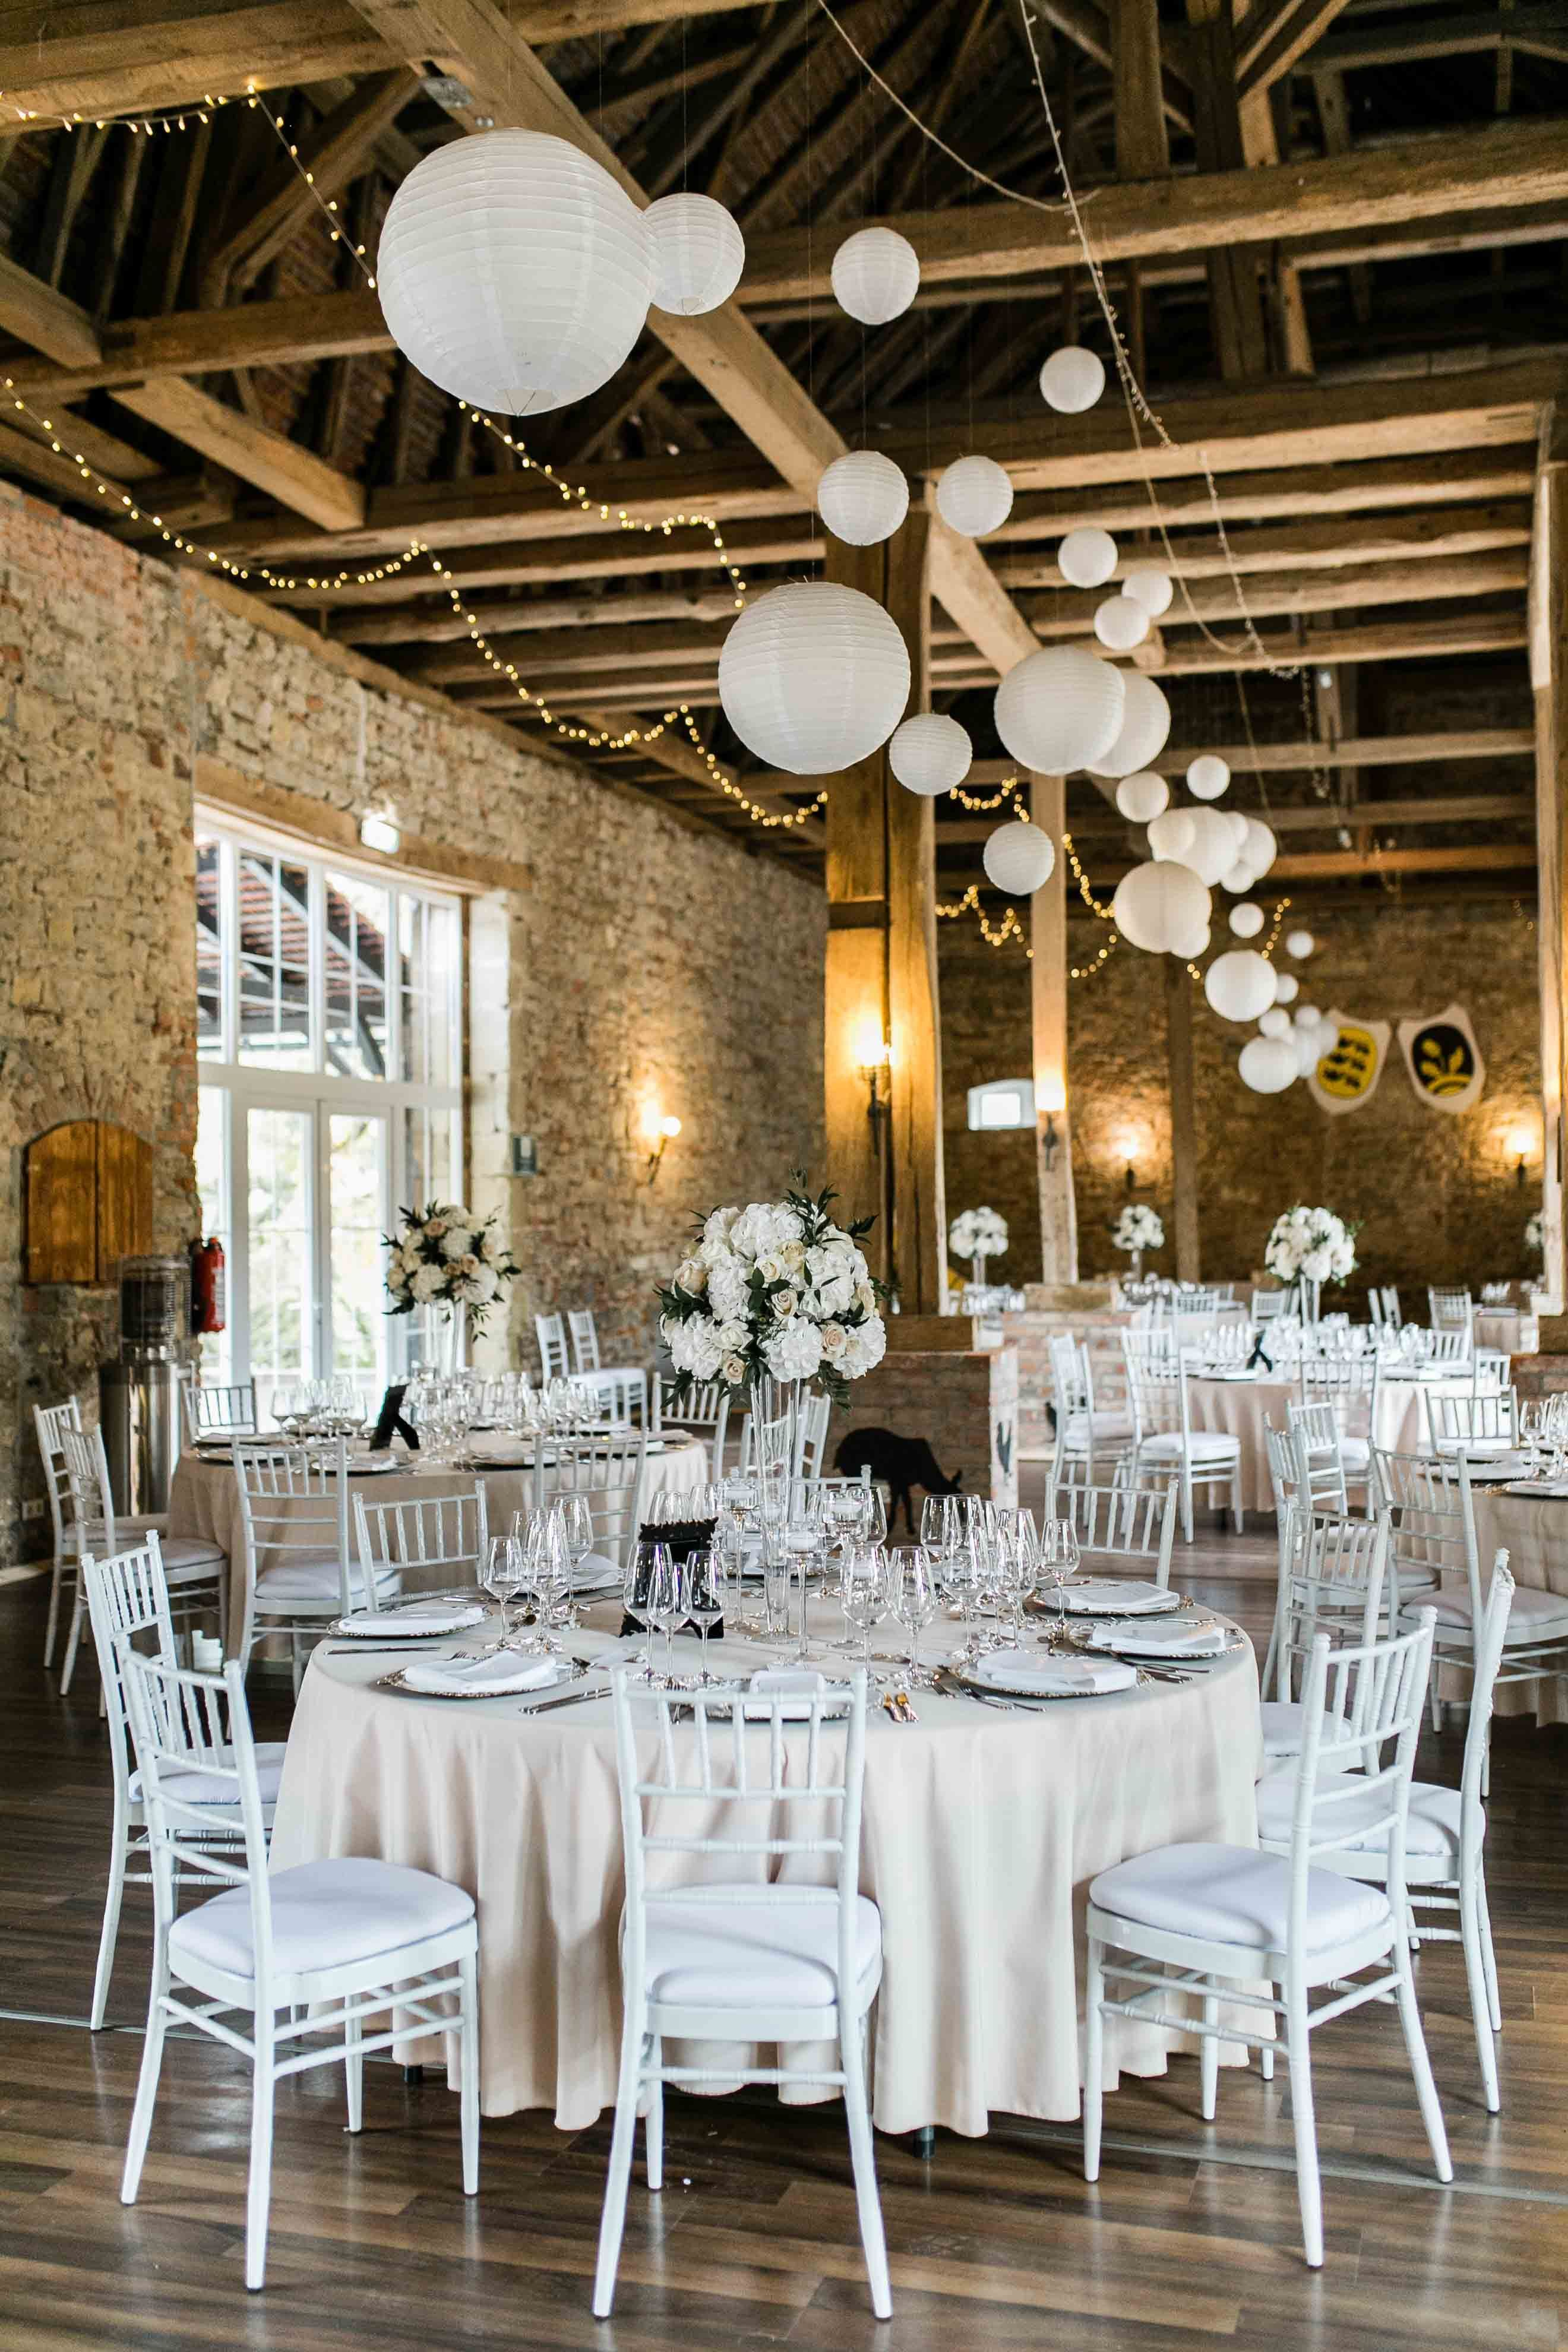 Hochzeitsdekore Saal Eventscheune Schloss Assumstadt Nicole Hafner Fotografie Hringen Heiraten In Hringen Hochzei In 2020 Best Wedding Colors Wedding Locations Decor